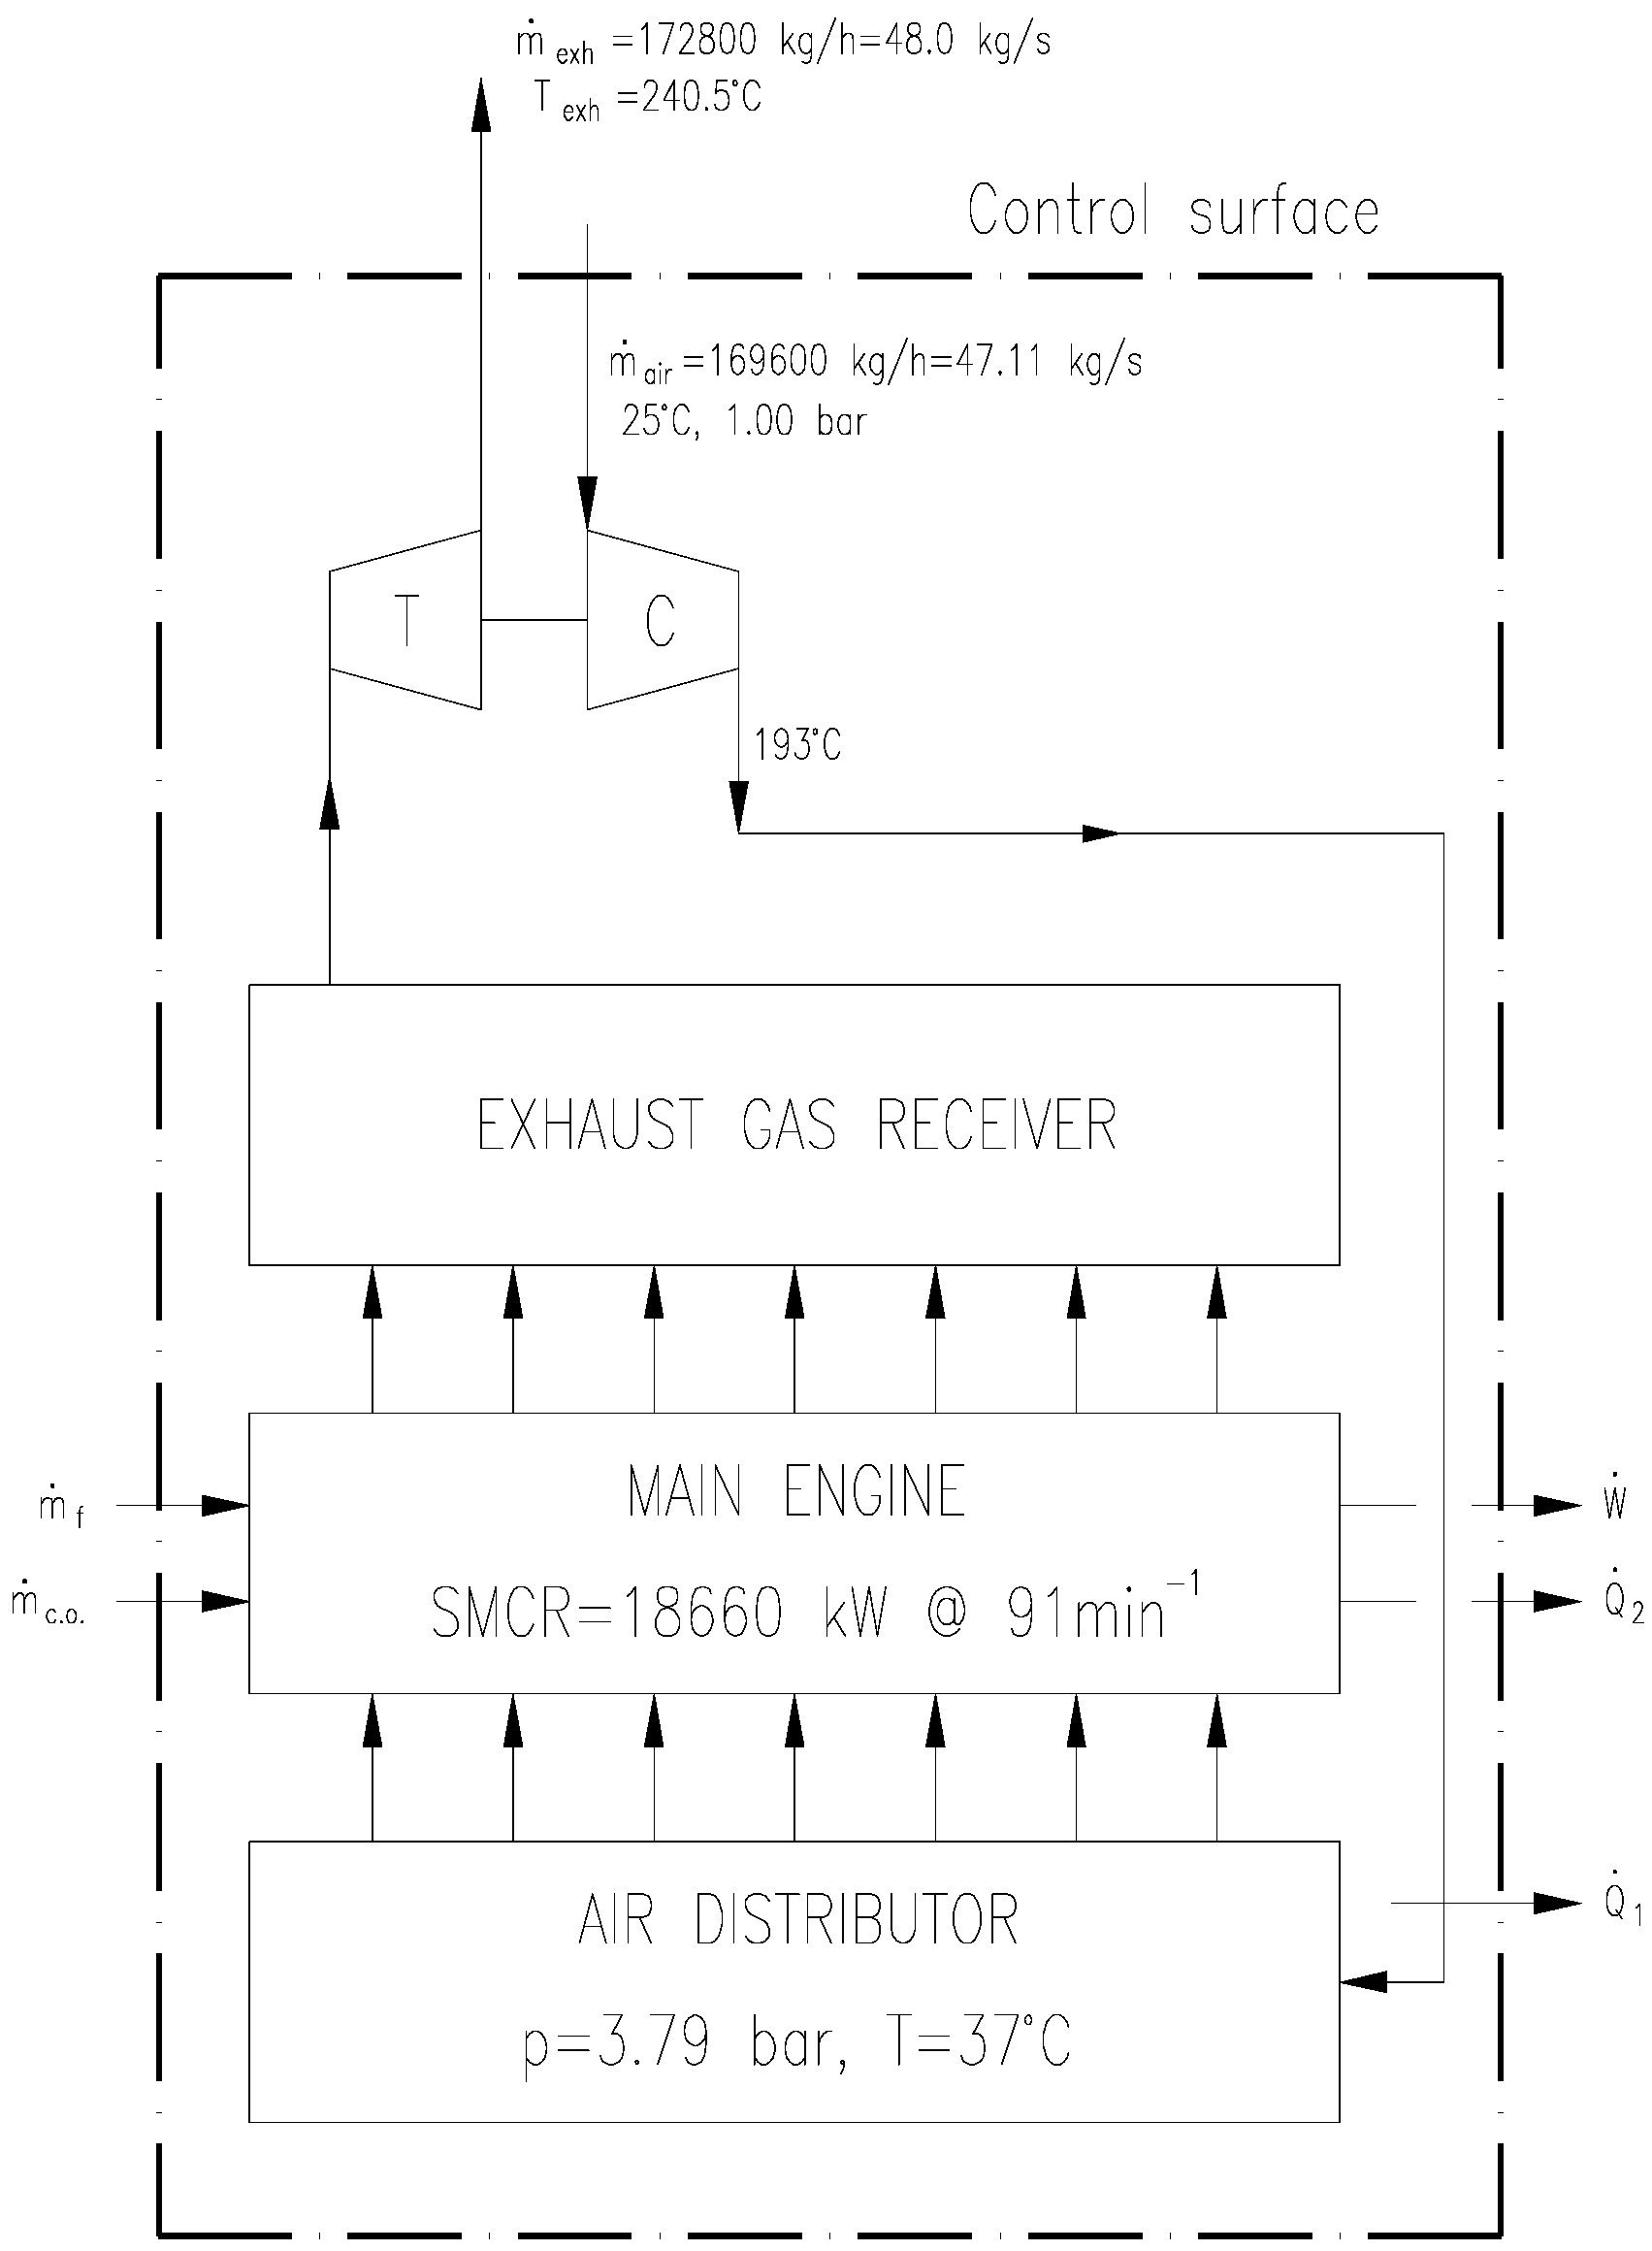 Valve Timing Diagram Of 4 Stroke Engine Energies Free Full Text Of Valve Timing Diagram Of 4 Stroke Engine